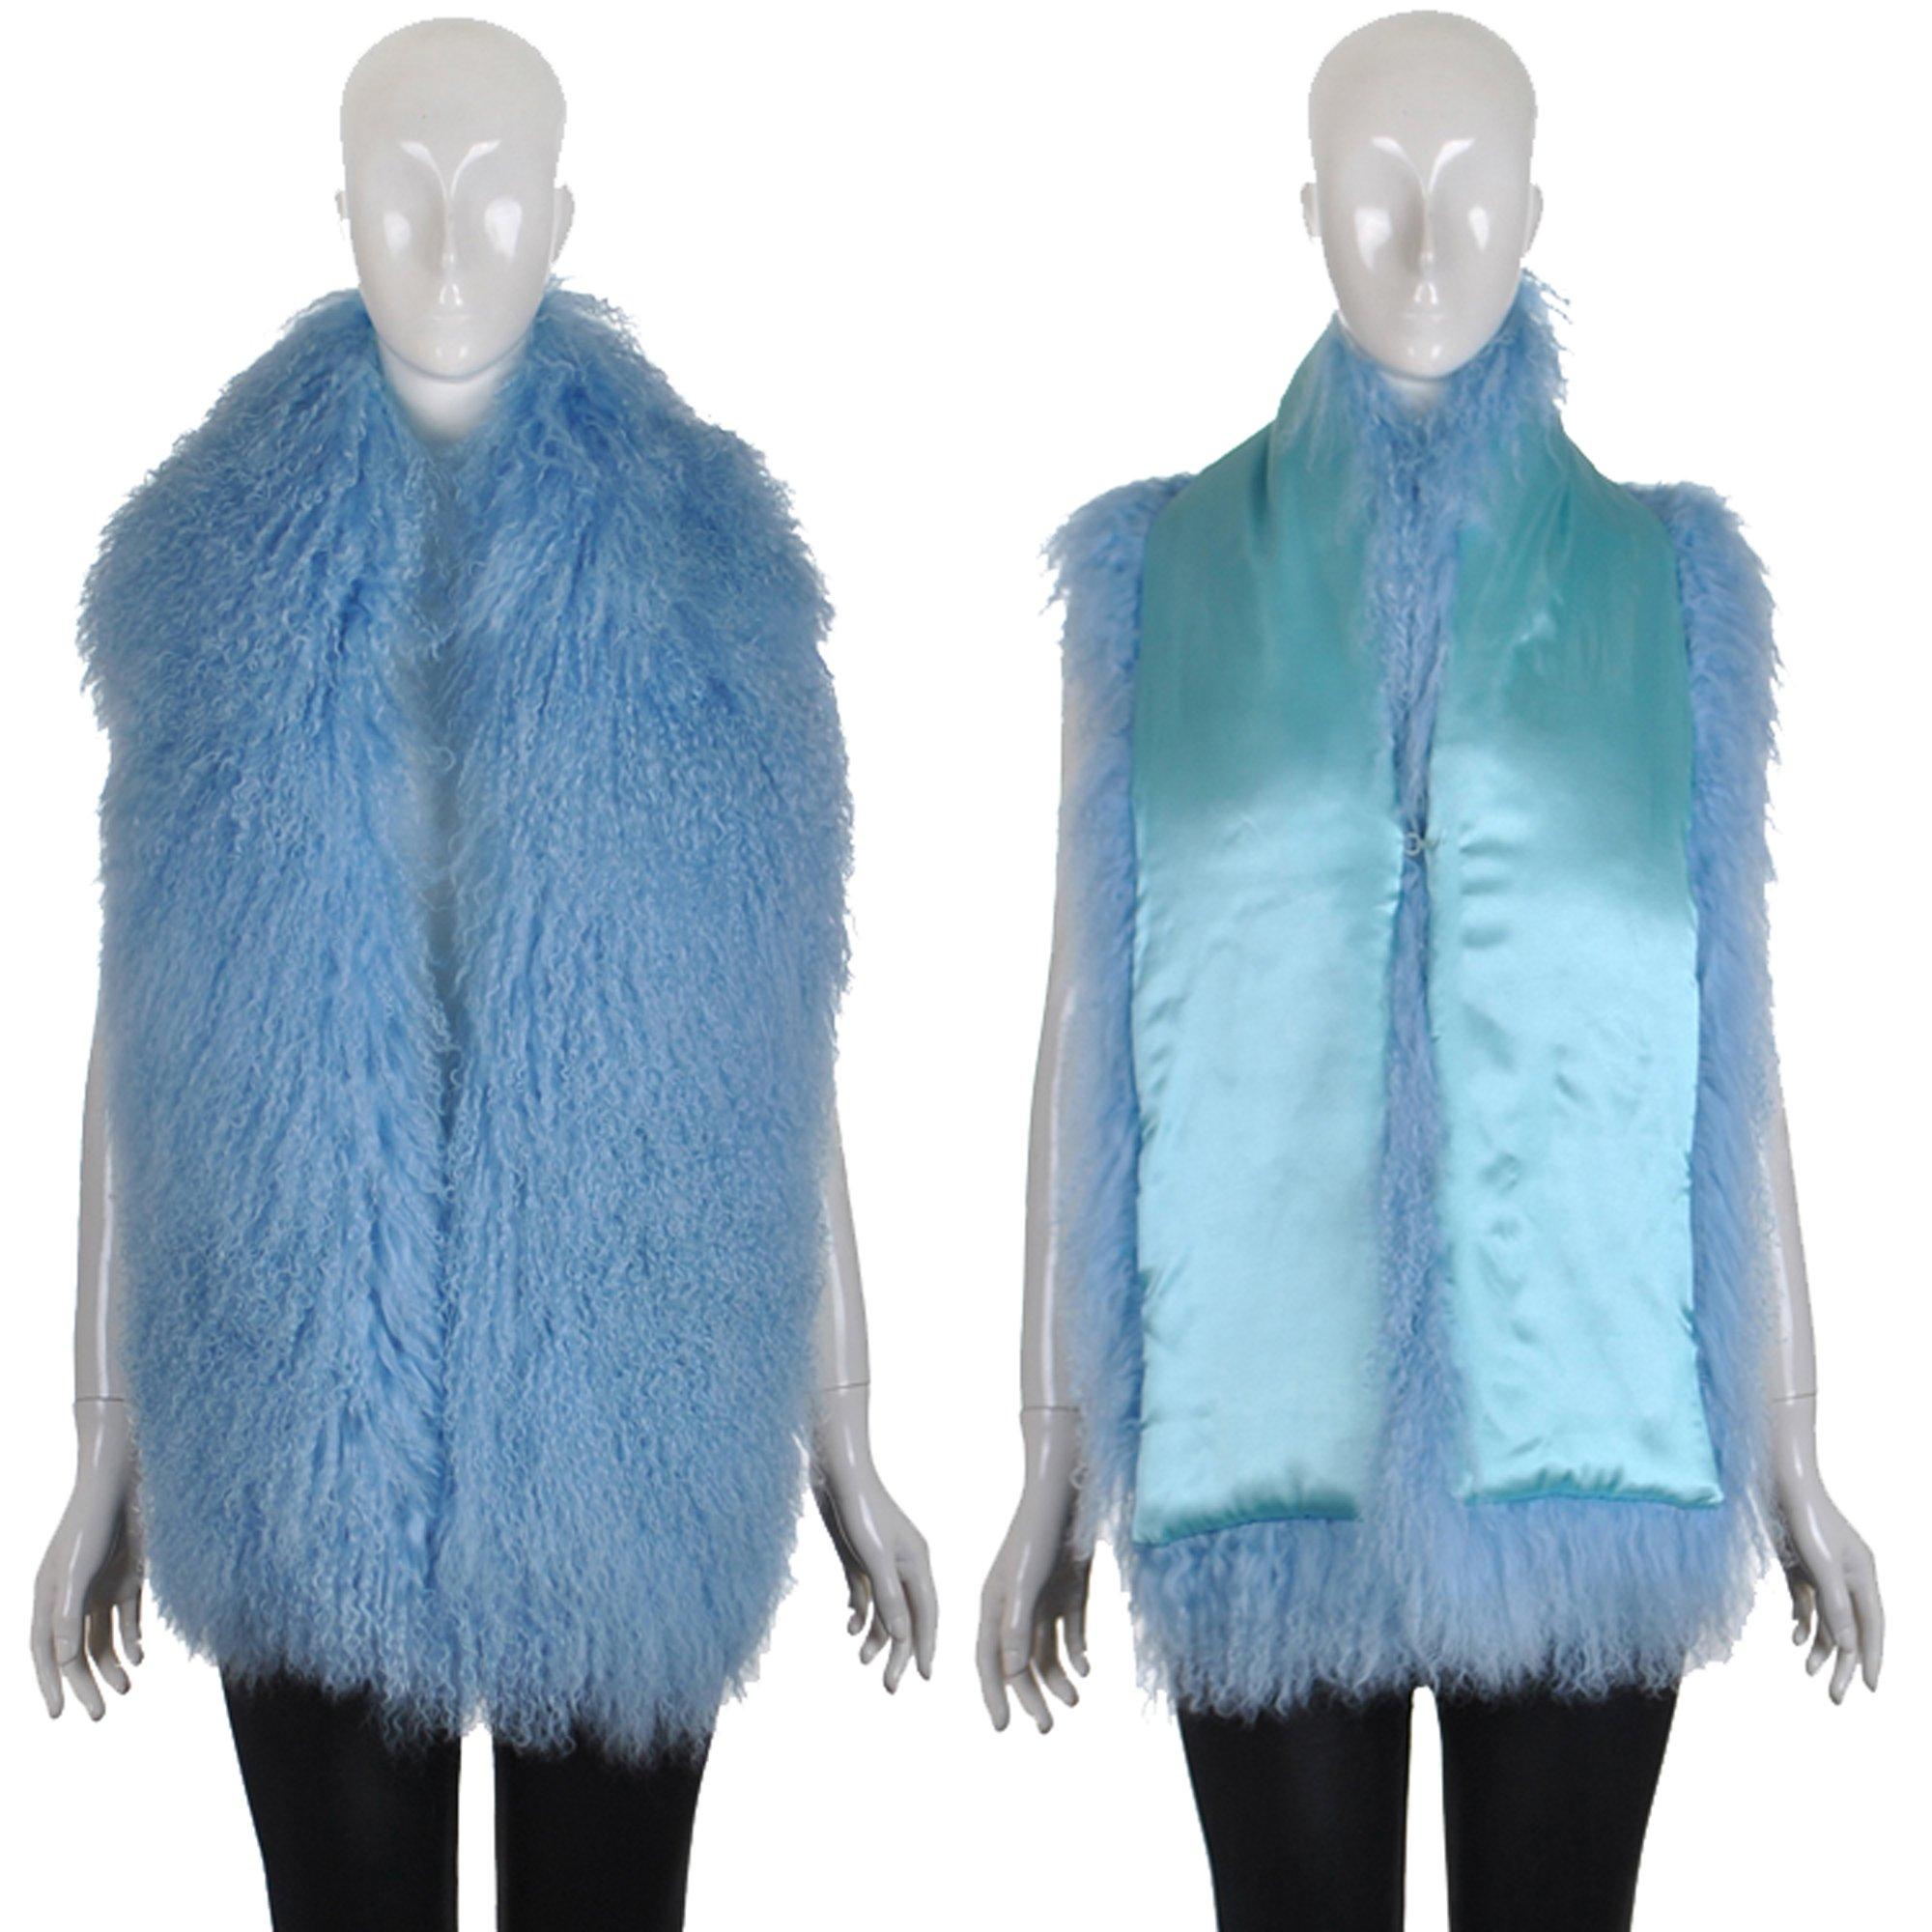 Ysting Women's Winter Scarf Wrap Large Beach wool Real Fur Collar Shawl Shrug Fluffy Collors (E)